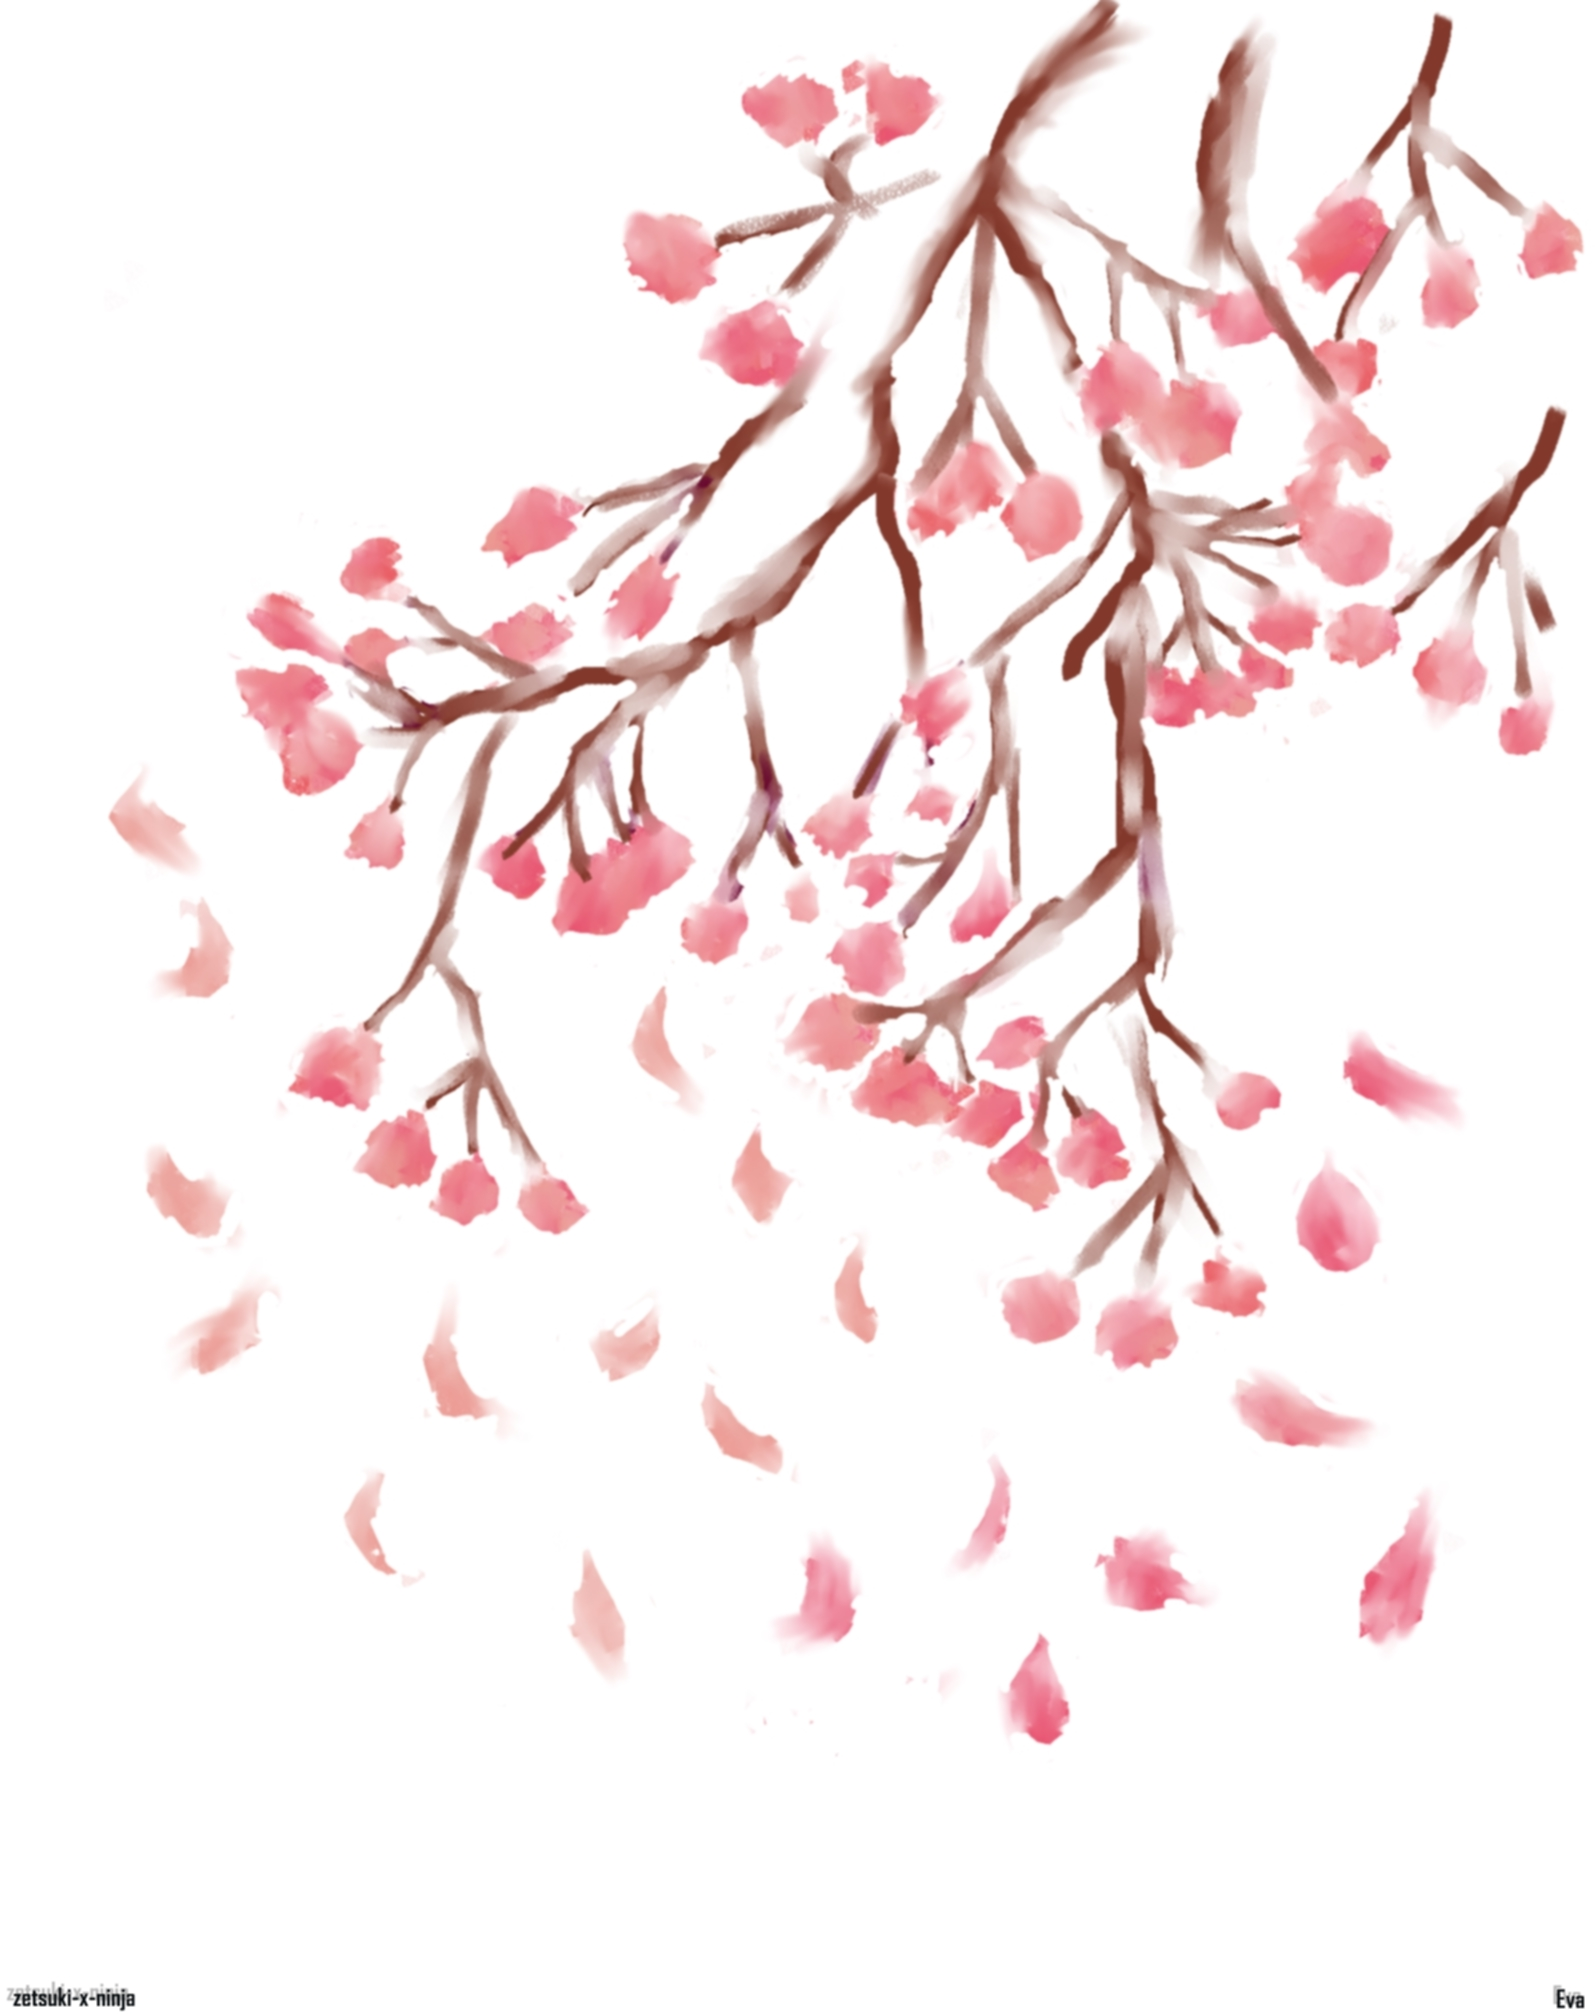 Drawn sakura blossom anime Ninja blossoms  2 2